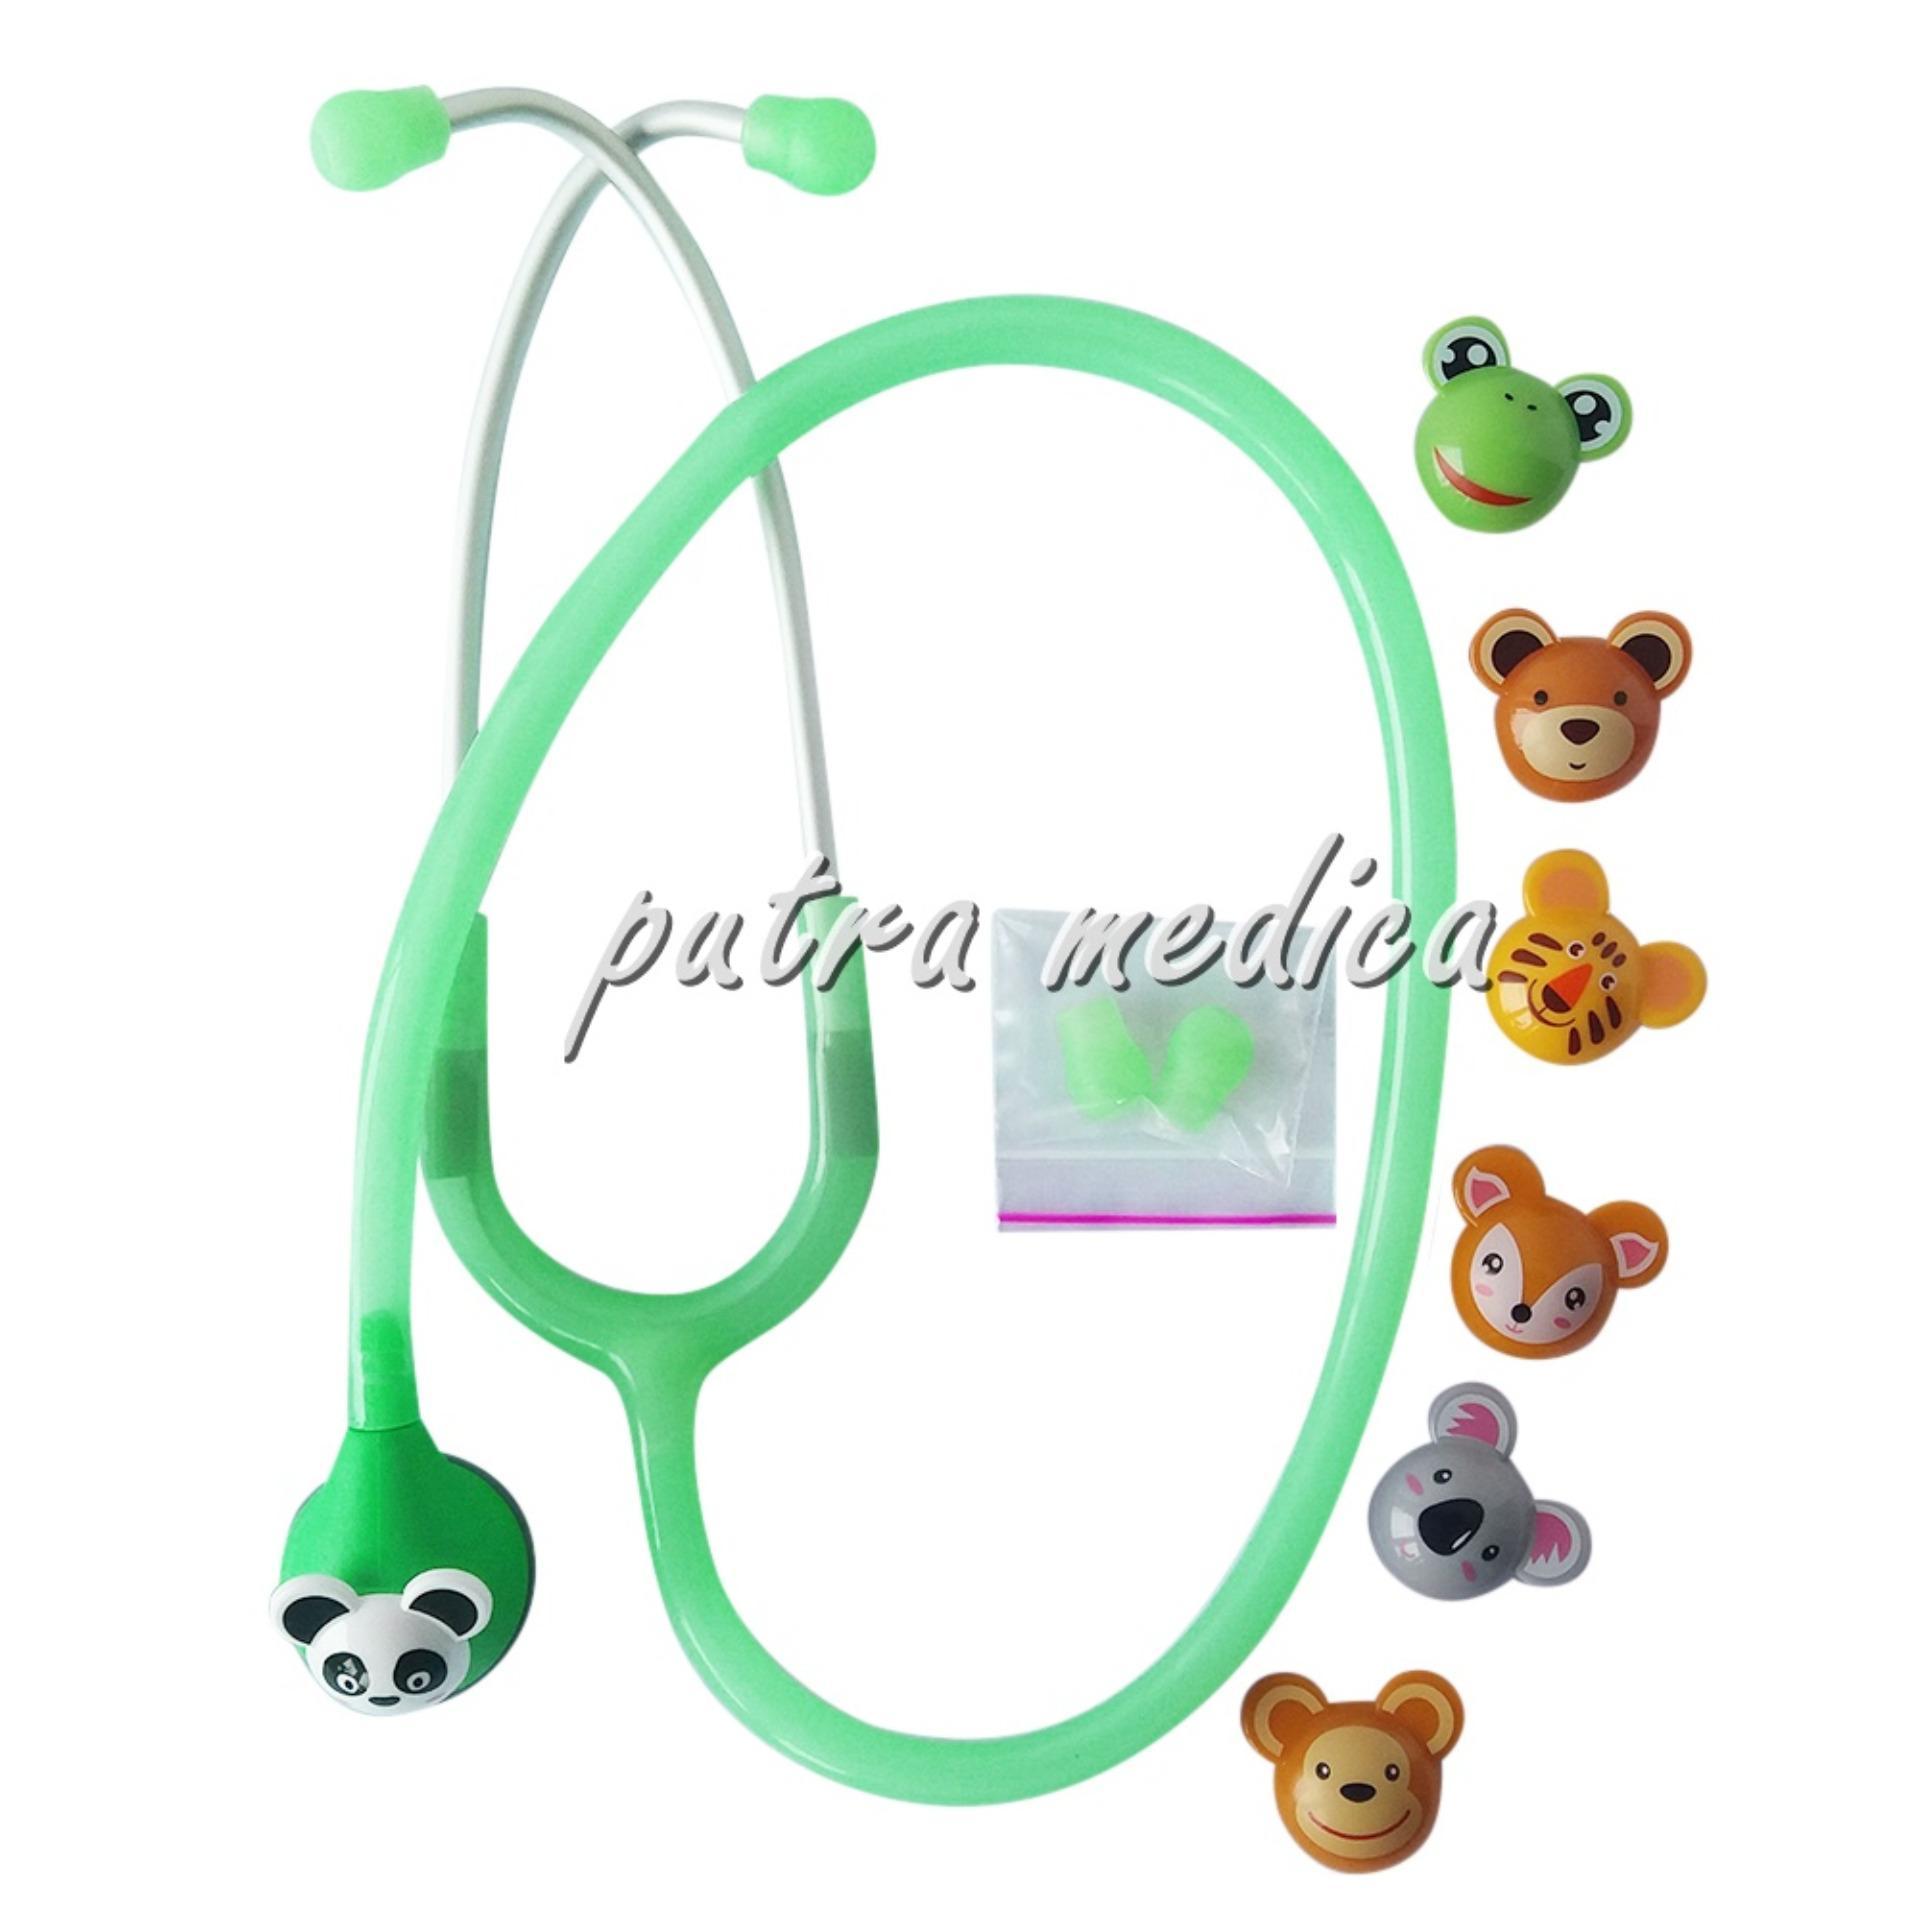 Beli Putra Medica Abn Toonscope Stetoskop Anak Karakter Frosted Green Stetoskop Warna Warni Boneka Lucu Alat Kedokteran Seken